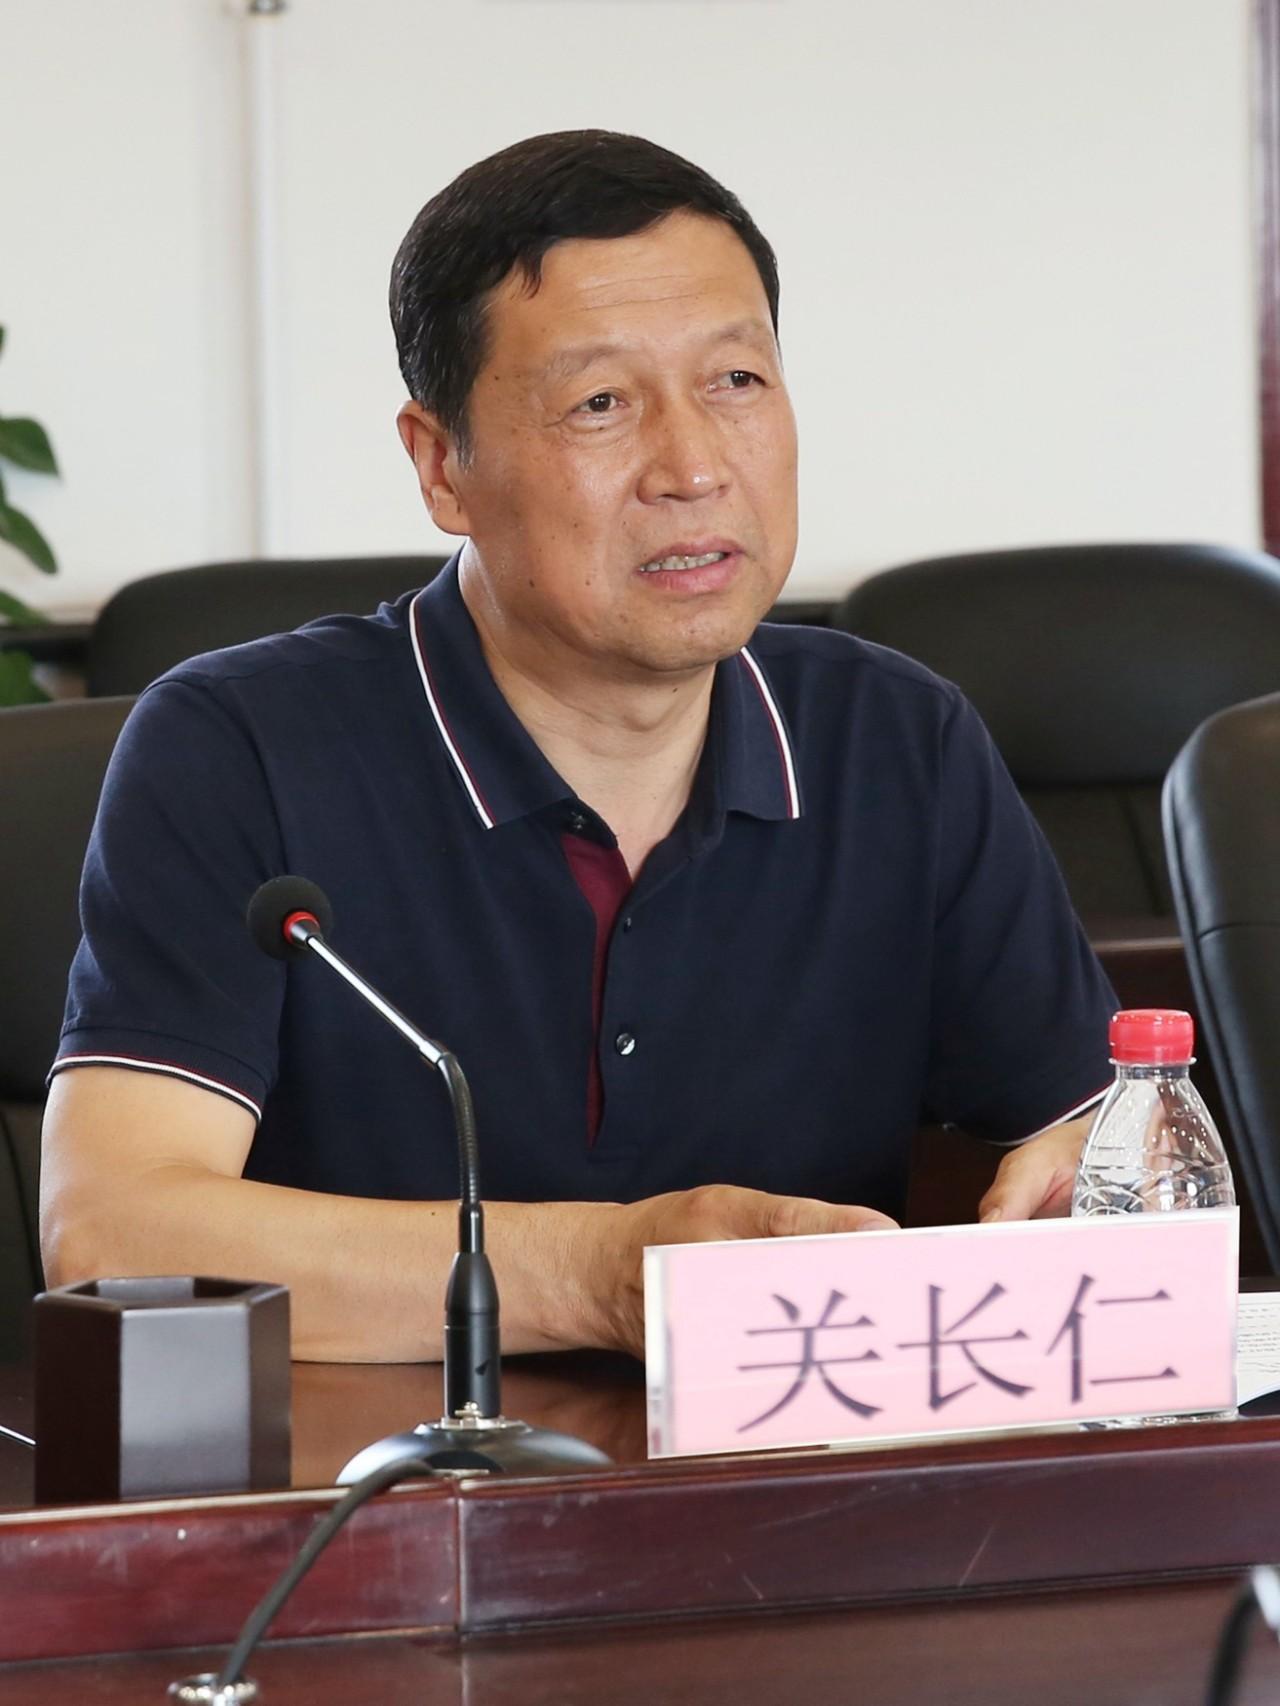 http://www.hljold.org.cn/shishangchaoliu/77824.html